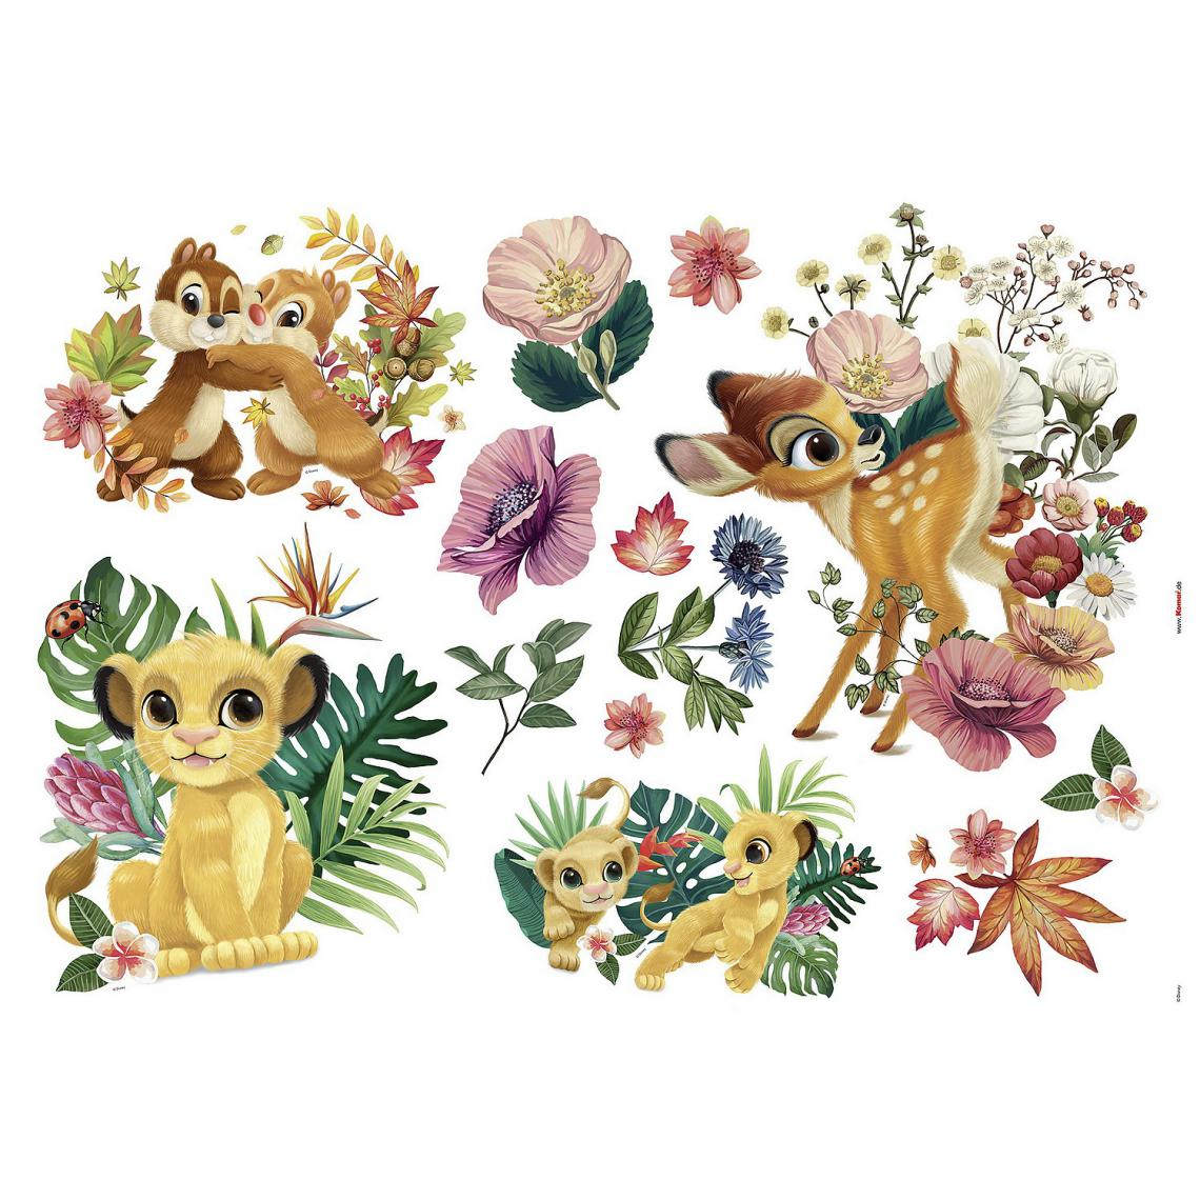 Komar Sticker mural géant Be in Nature Simba, Timon et Pumba Le Roi Lion Disney